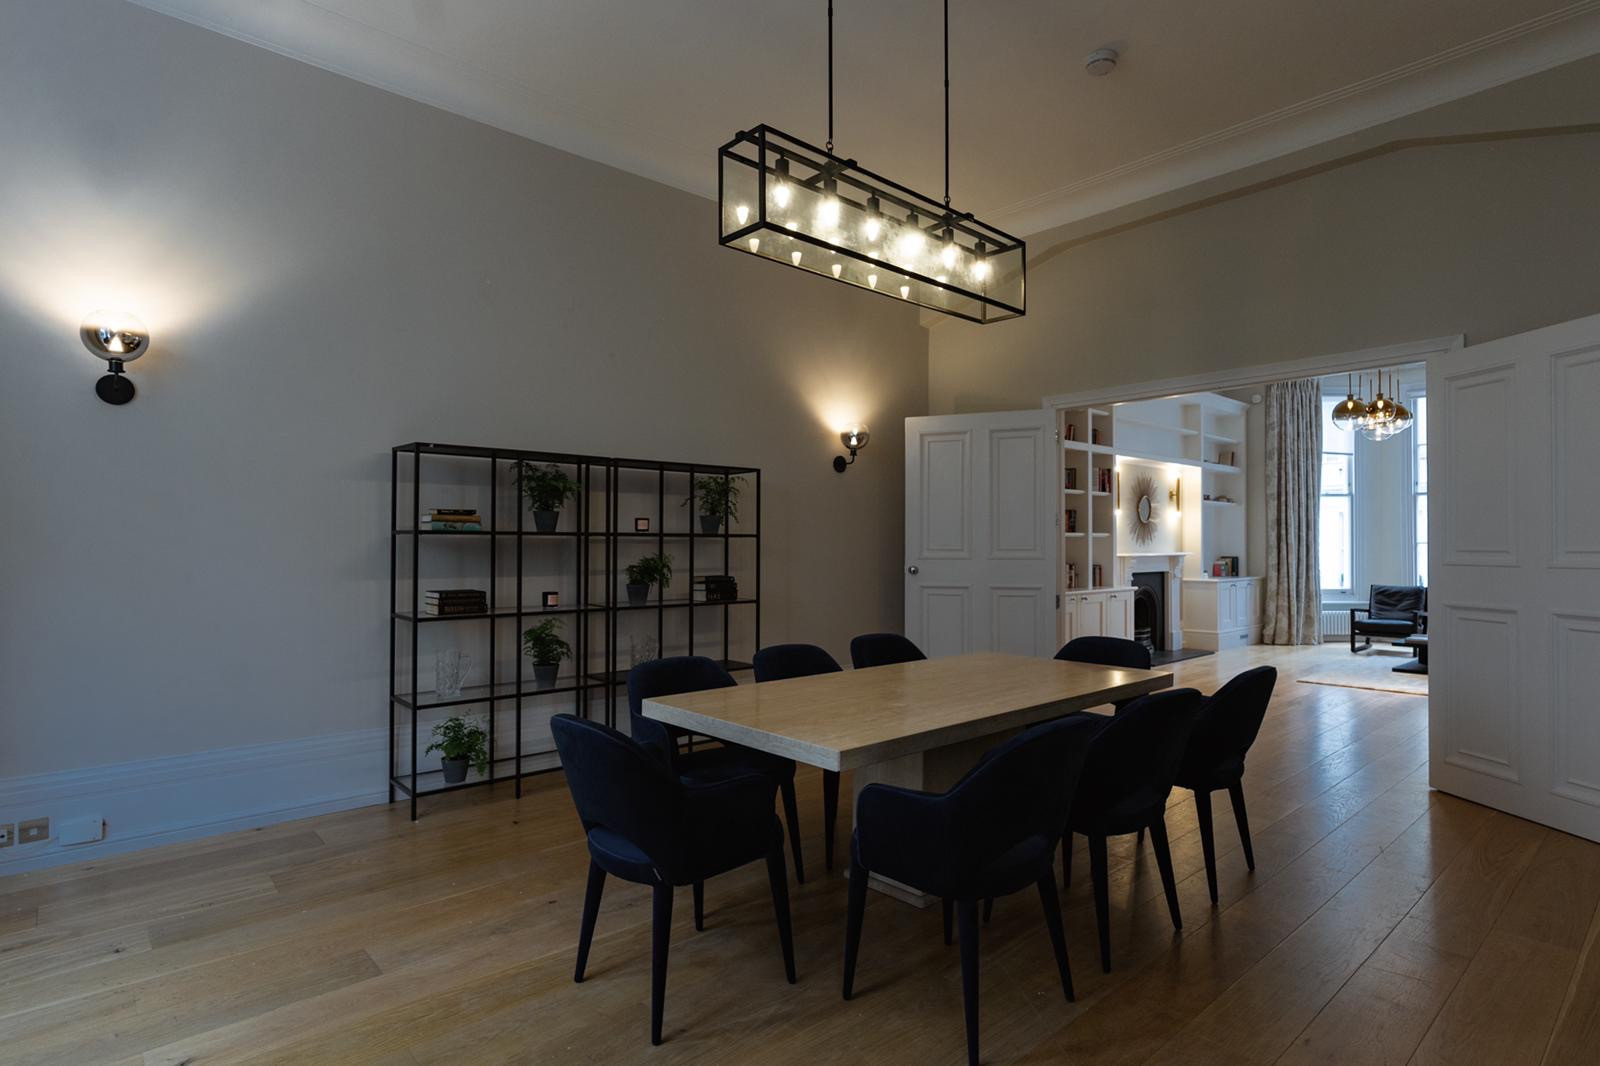 Private Residence | Kensington, London UK